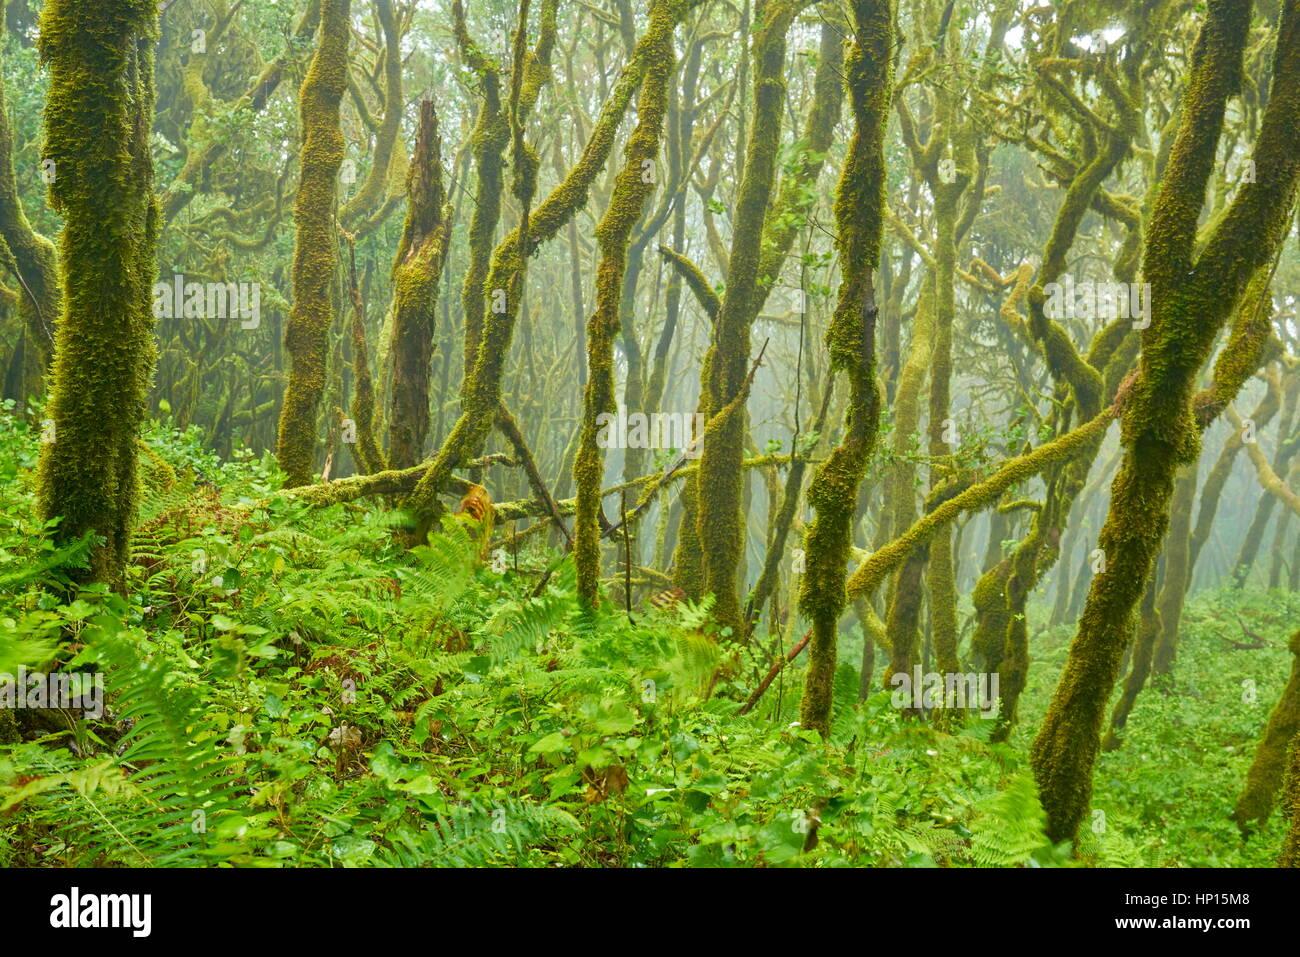 Laurel forest, Garajonay National Park, La Gomera, Canary Islands - Stock Image